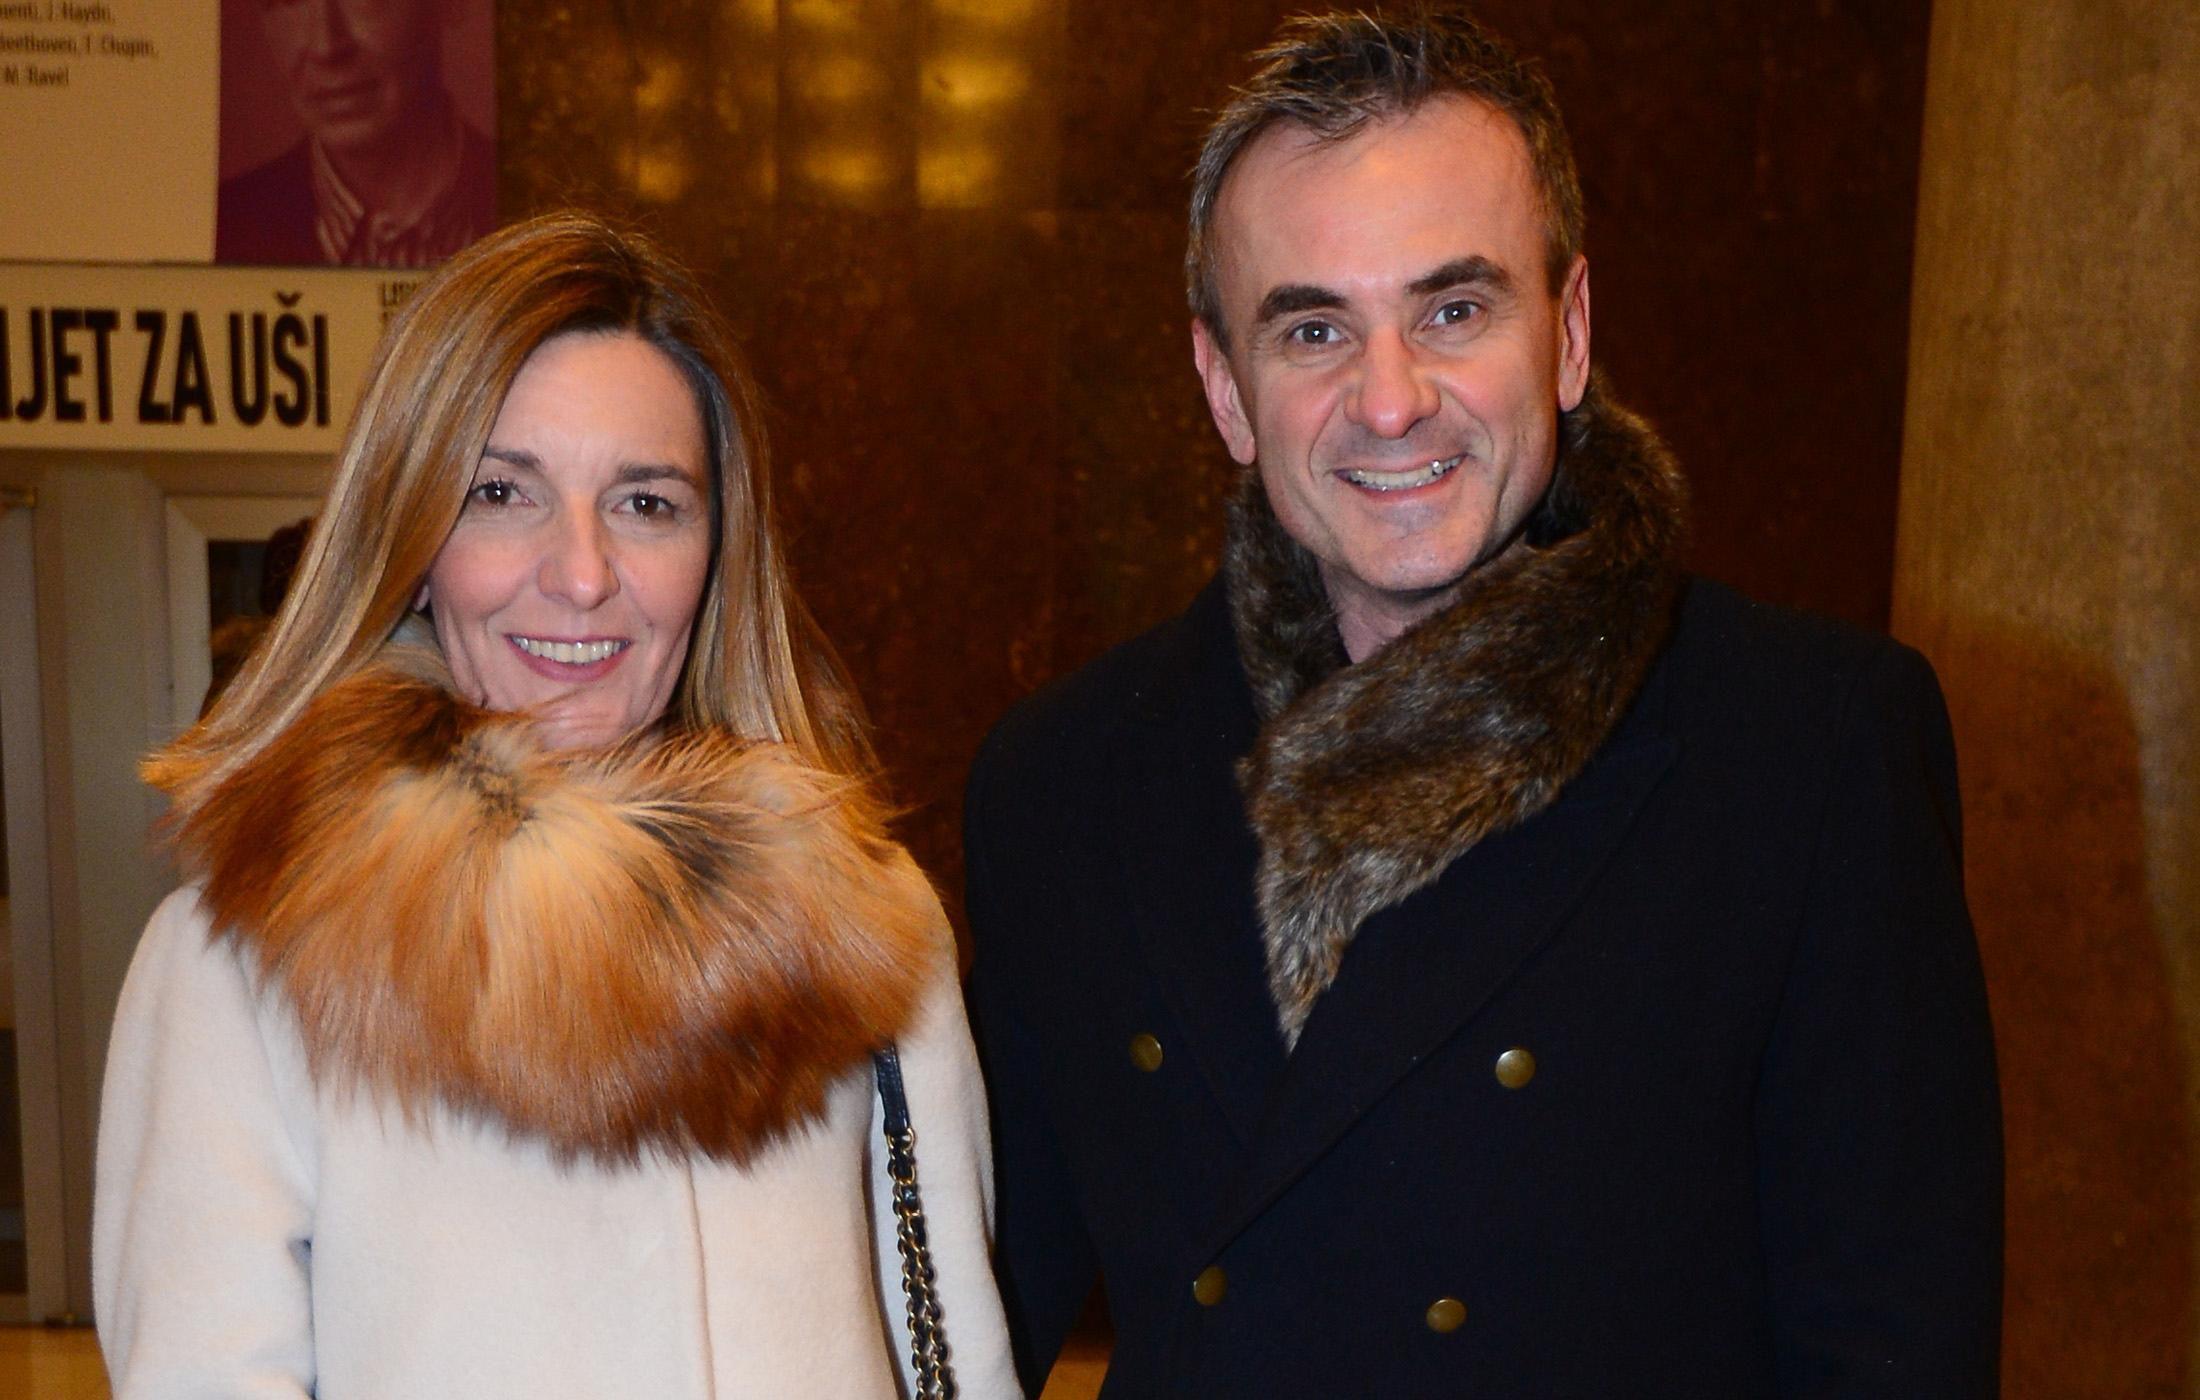 Davor Meštrović i njegova supruga vole isti modni detalj - krznenu stolu!